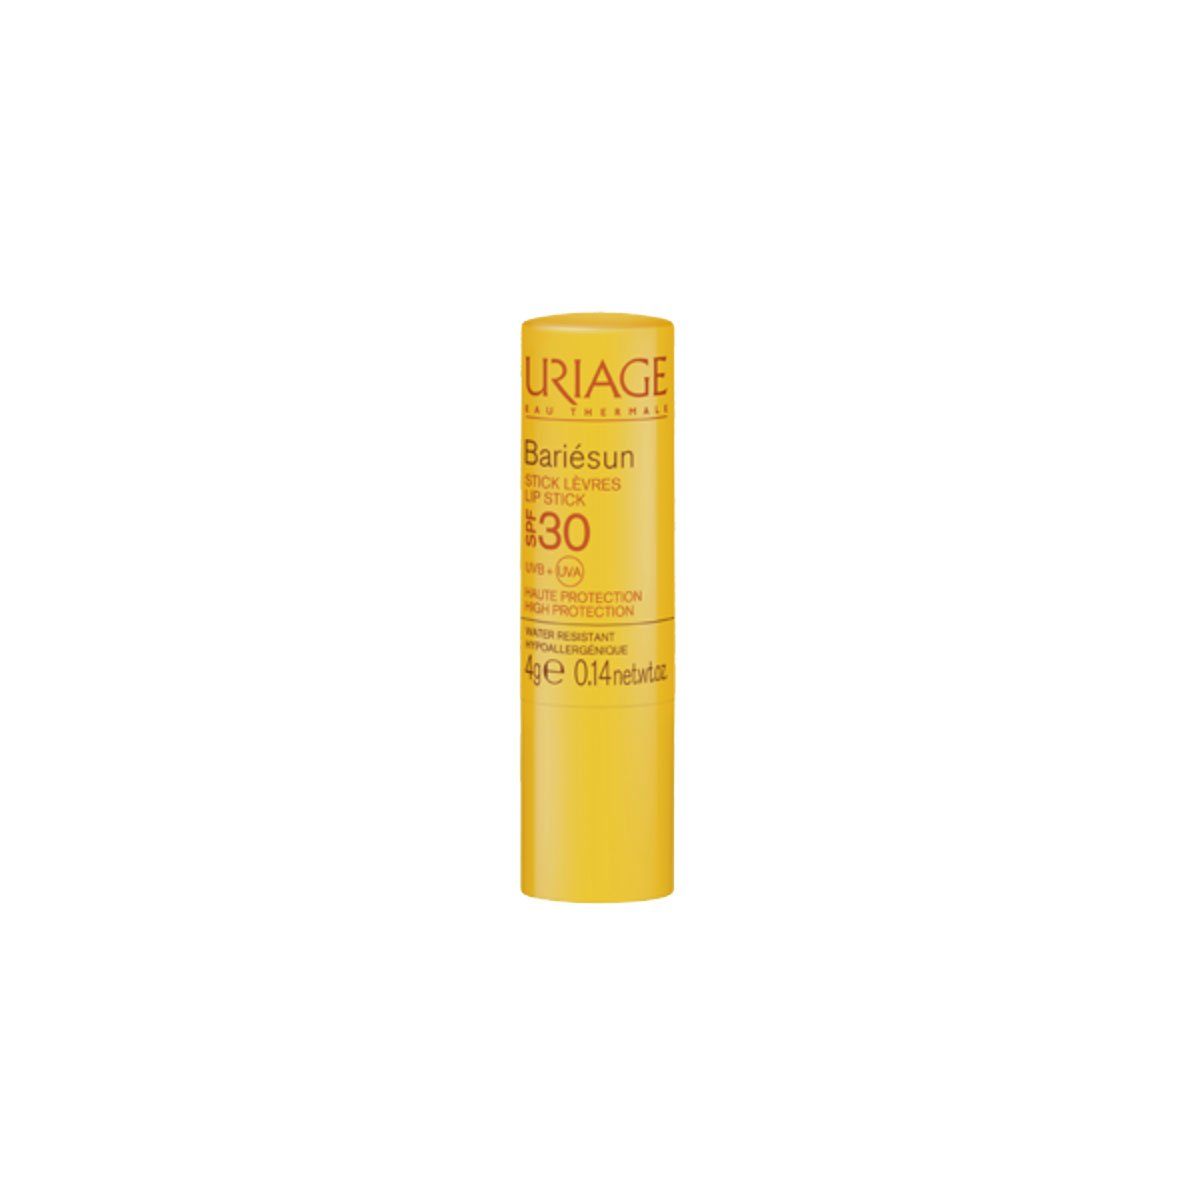 Uriage Bariesun Lip Stick Spf 30 4g